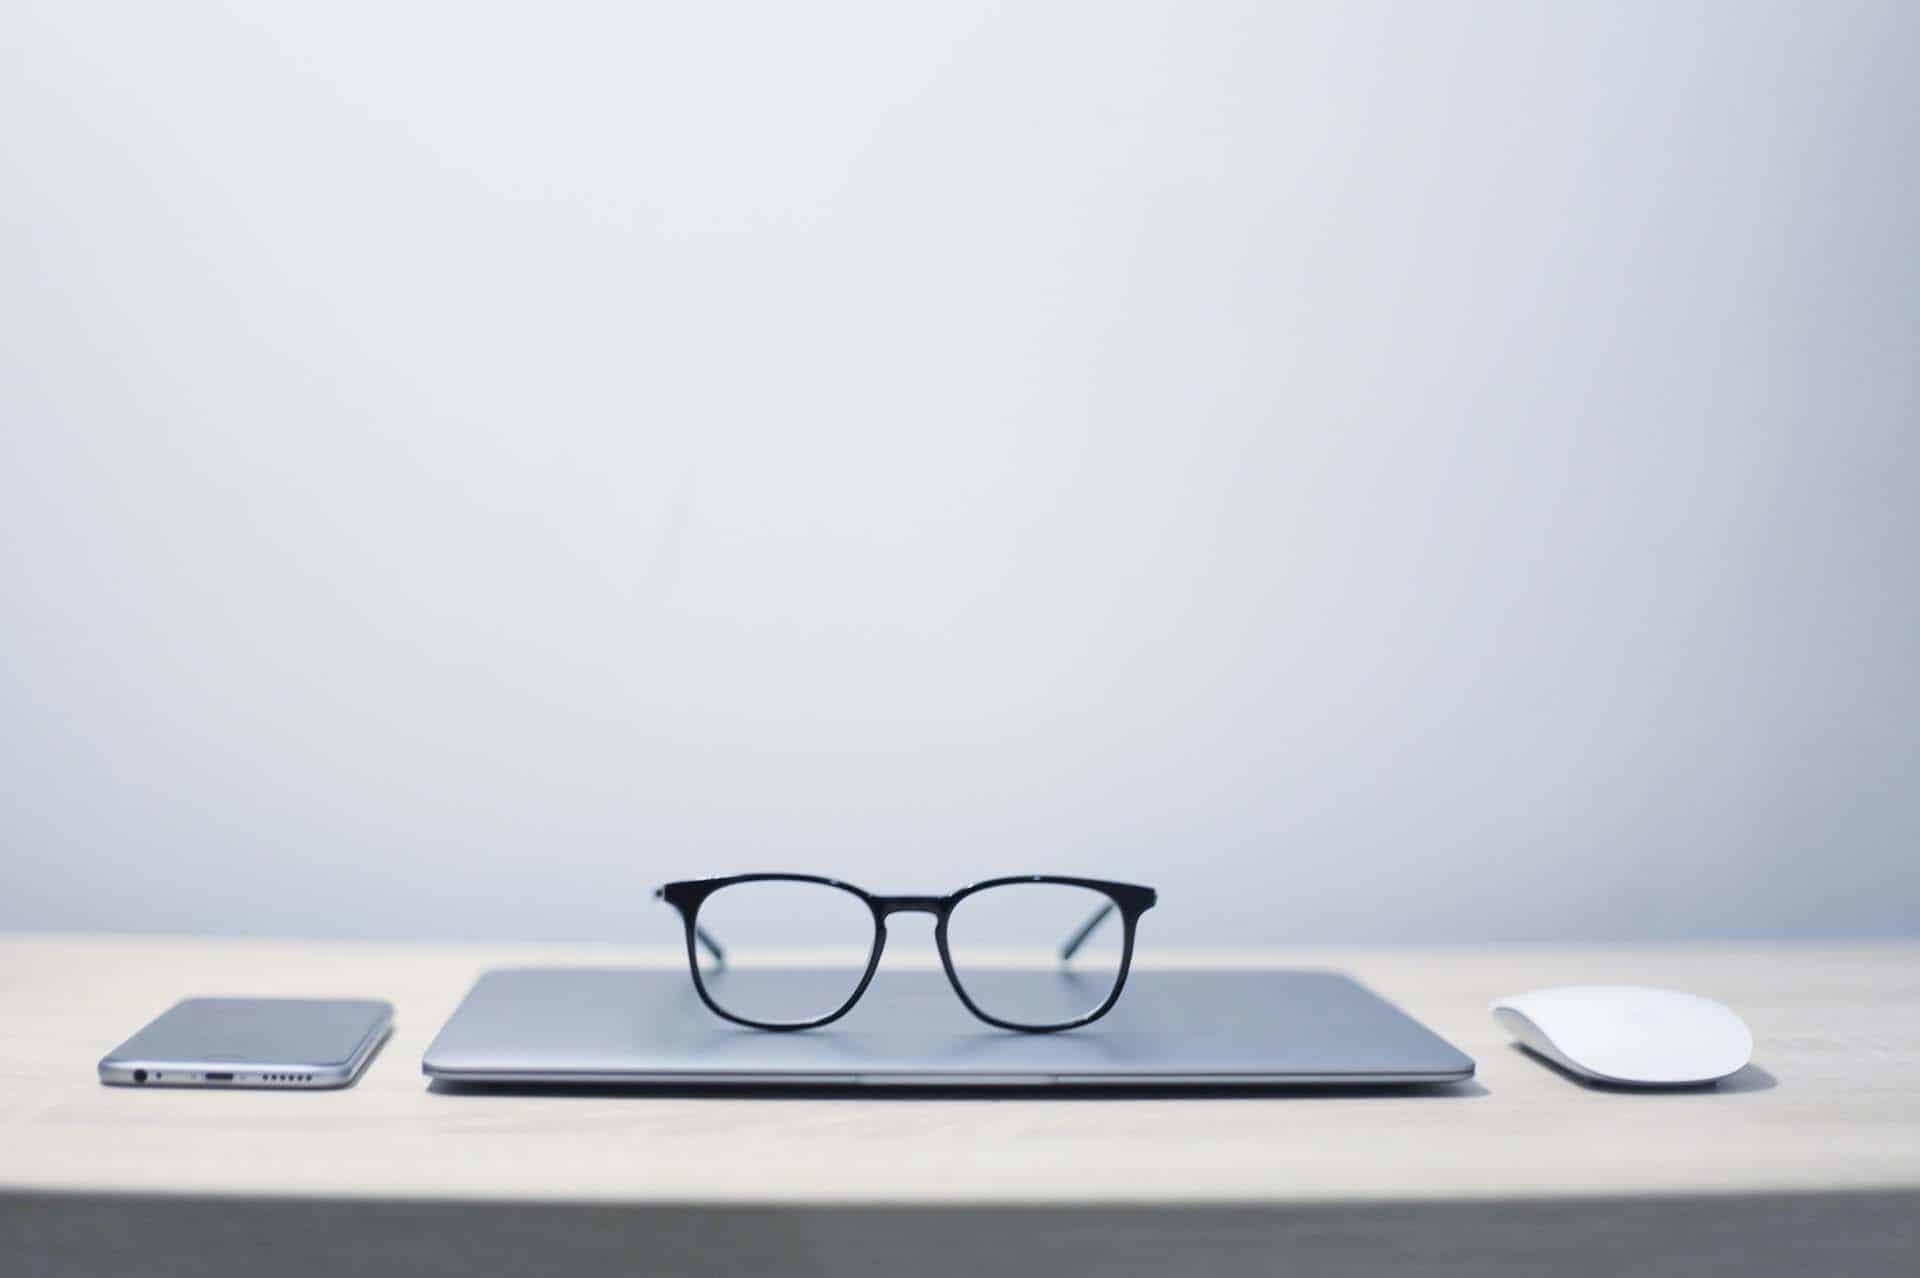 t2informatik Blog: The agile migration of an application